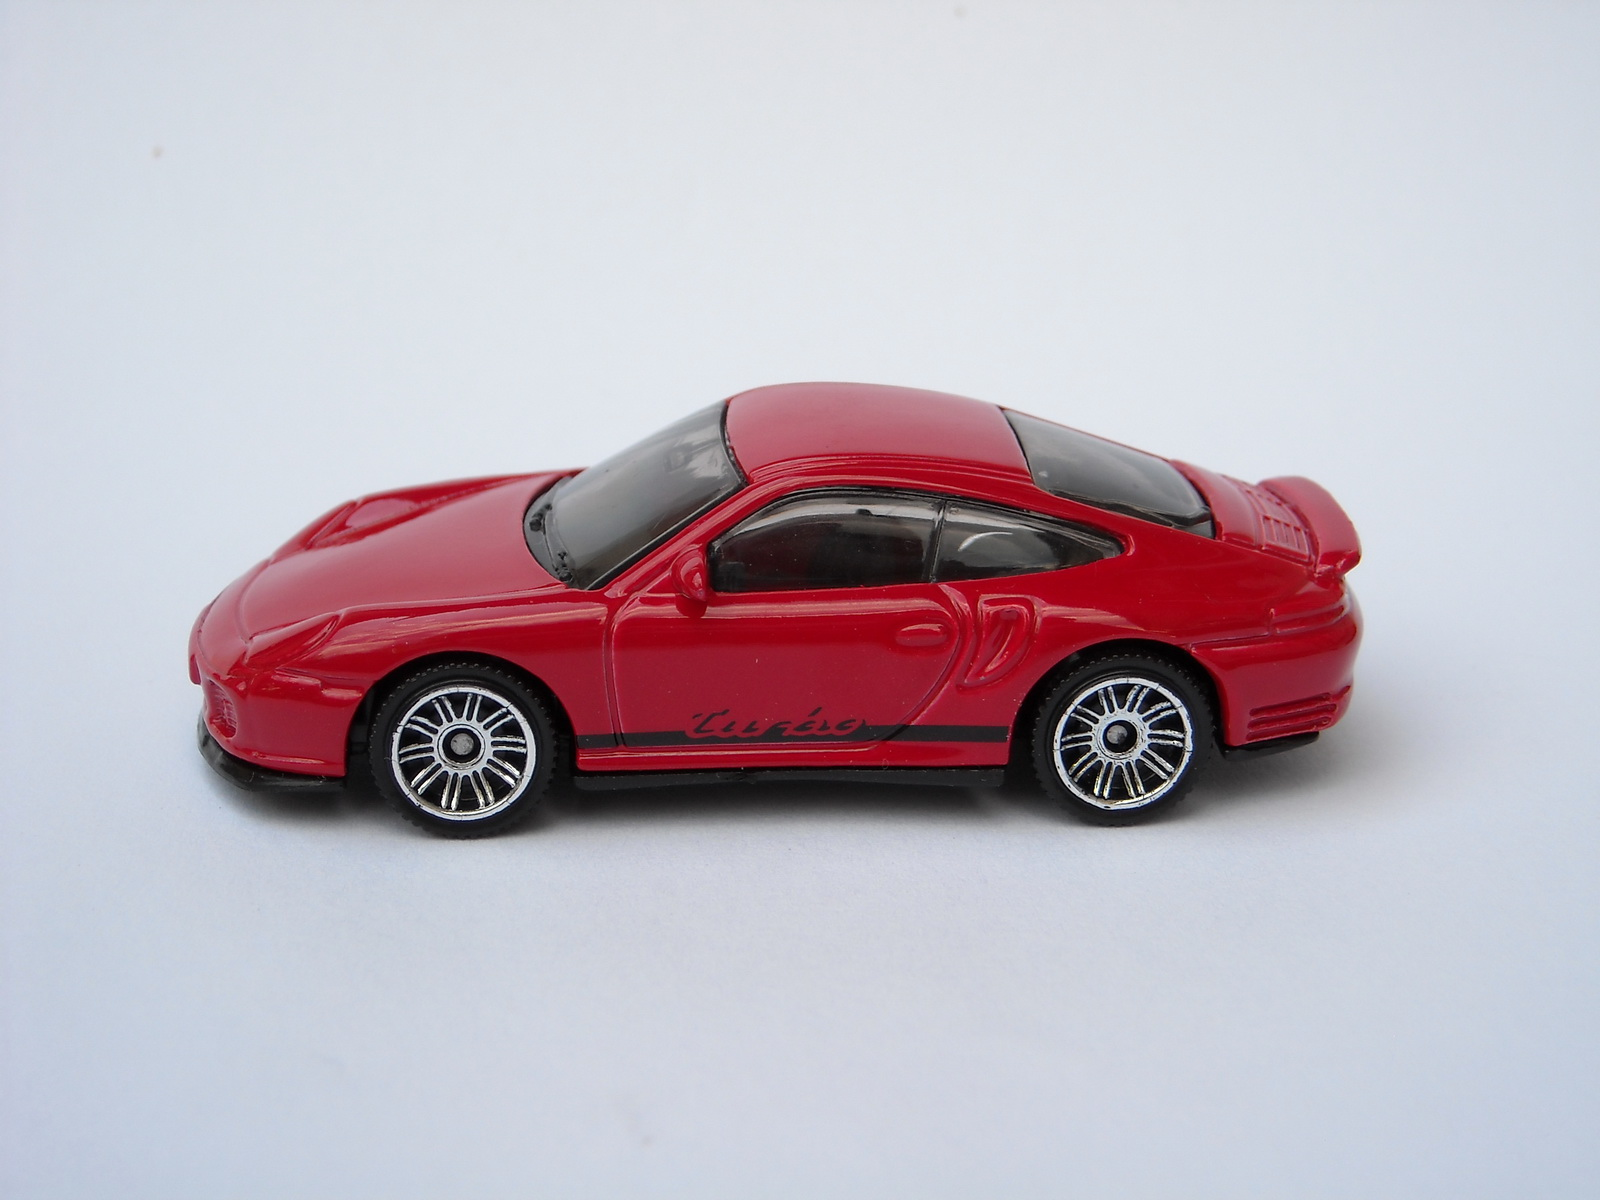 matchbox memories matchbox porsche 911 turbo. Black Bedroom Furniture Sets. Home Design Ideas